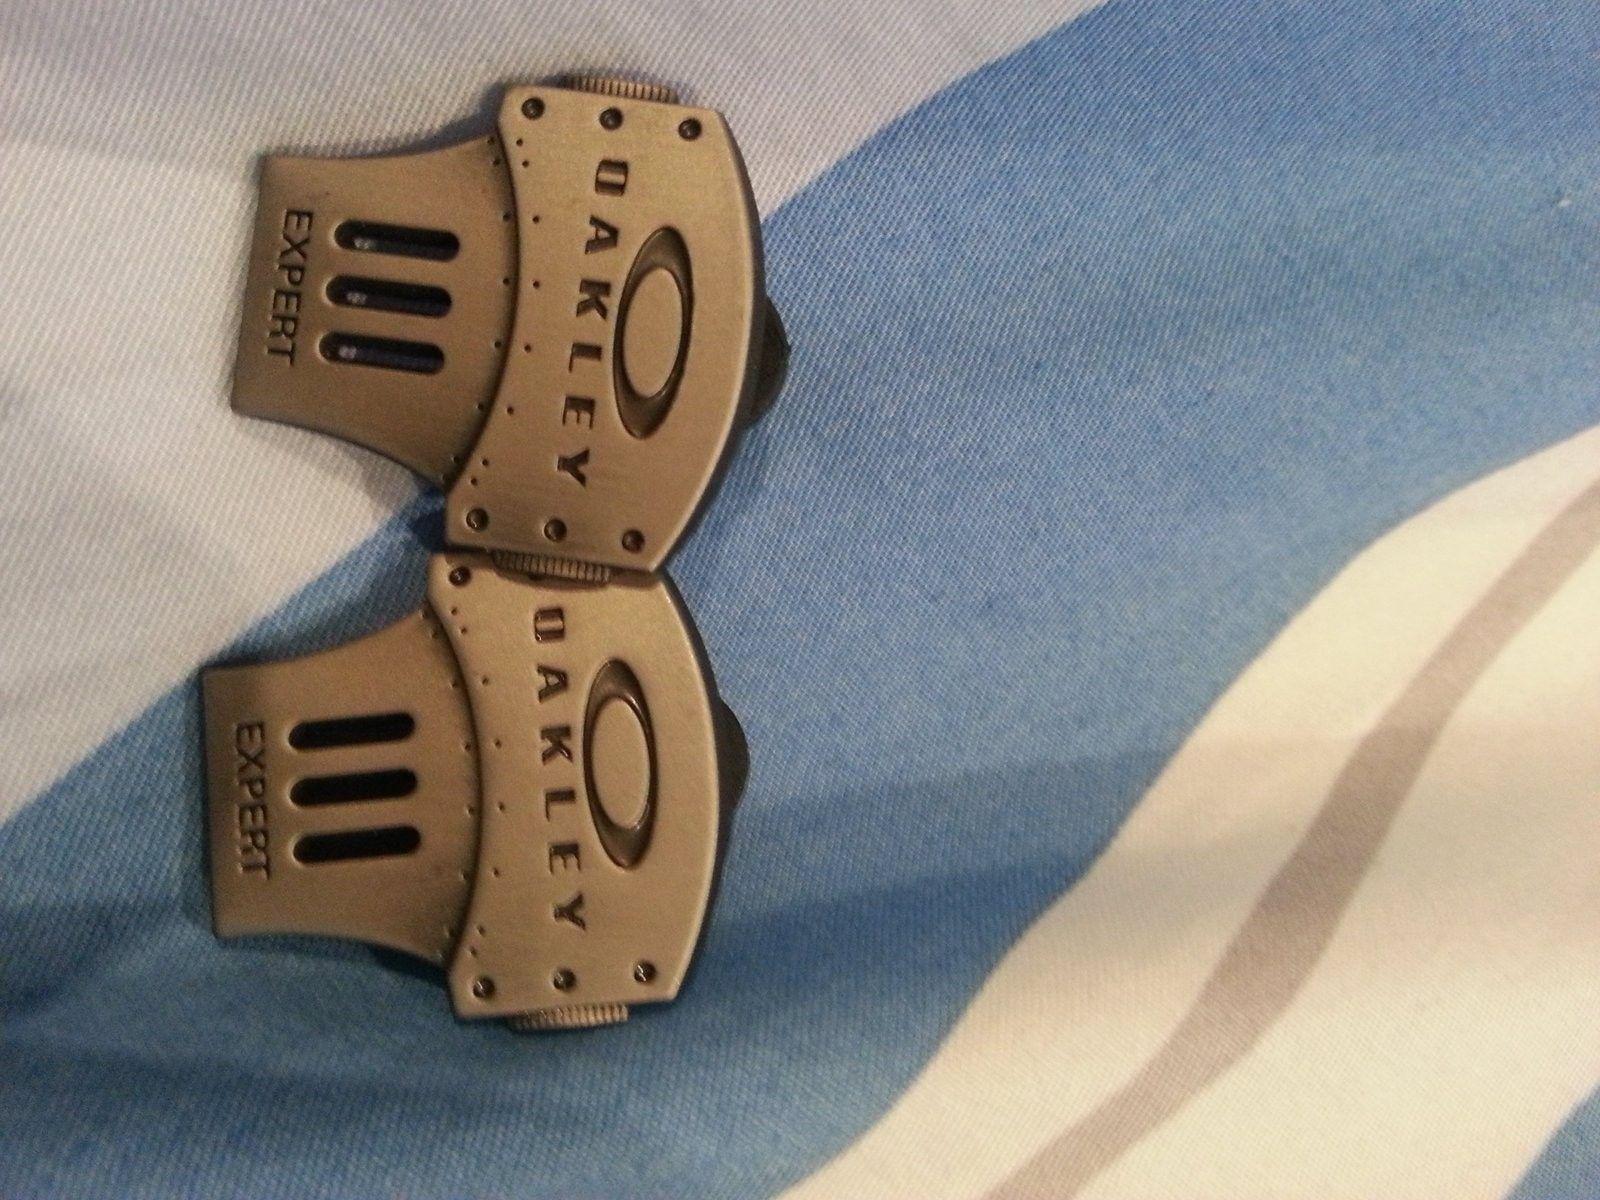 Oakley Expert Pin Collectors Edition - uploadfromtaptalk1446562771367.jpg